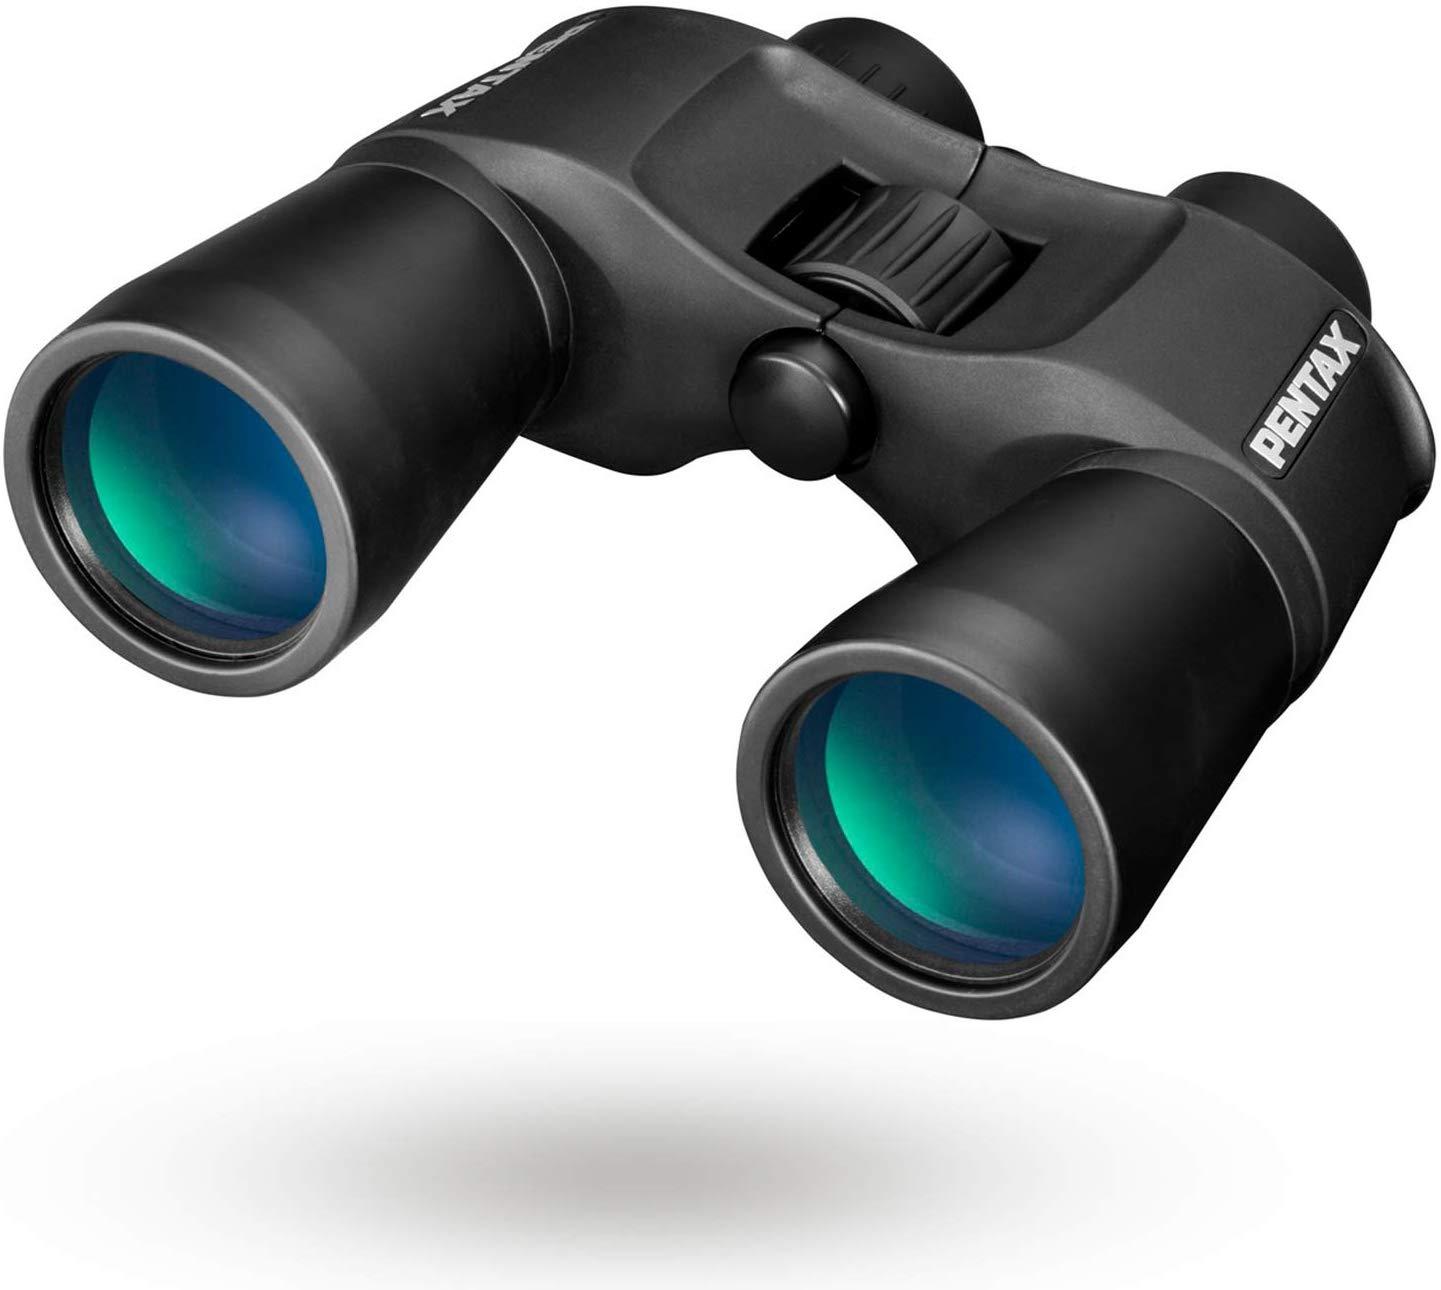 Pentax 10 x 50 SP Porro Prism Binocular - Black £75.64 @ Amazon